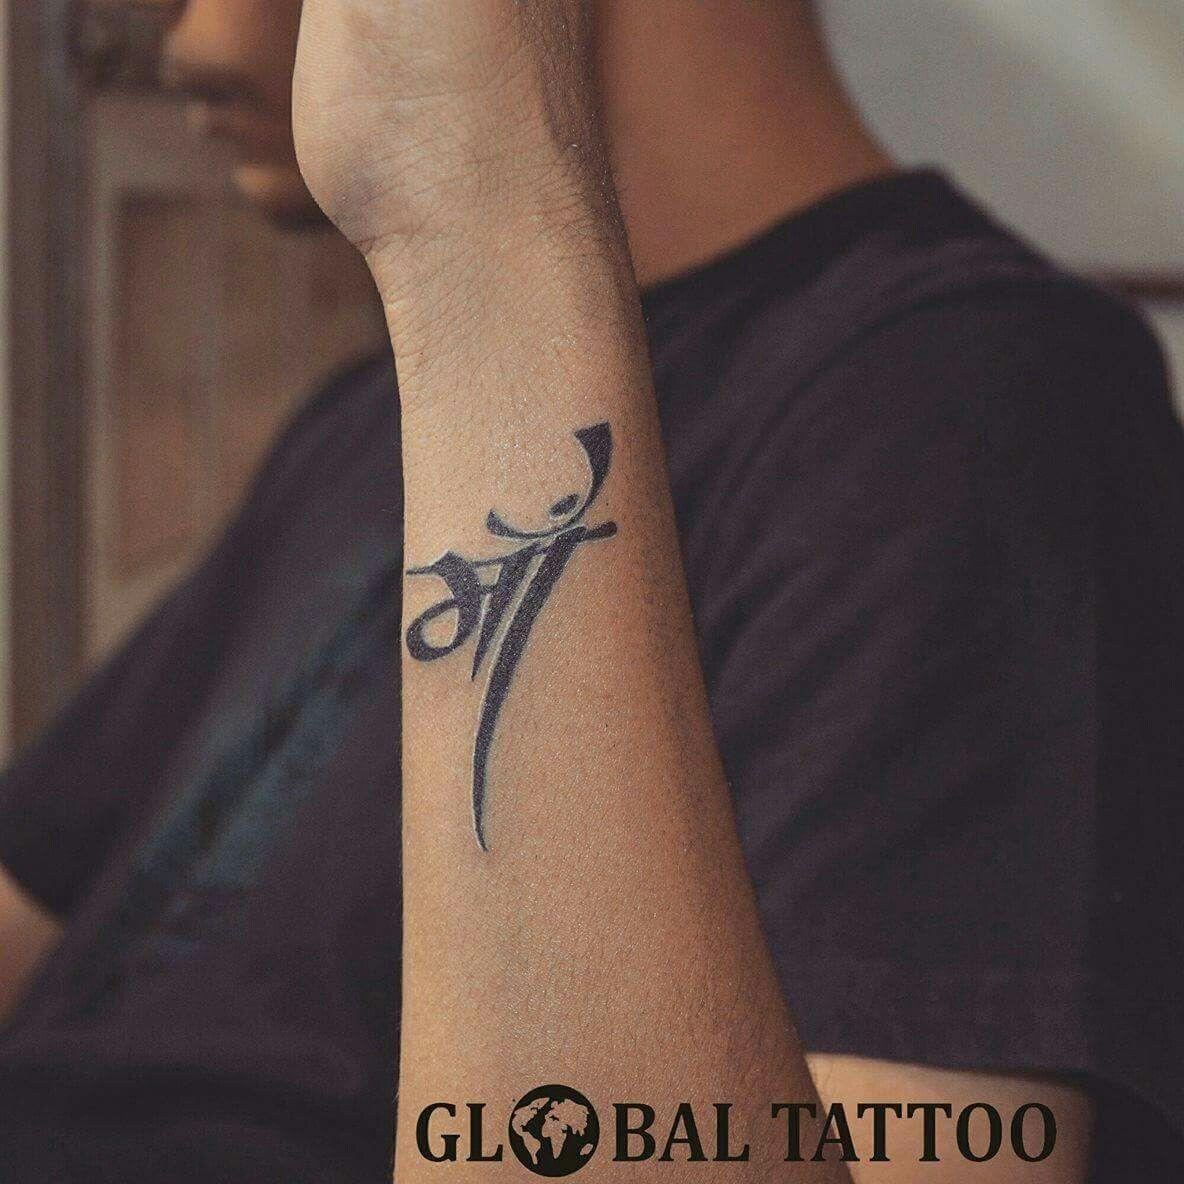 740ed75b2cca8 Maa tattoo in hindi | Tattoo work | Tattoos for guys, Maa tattoo ...